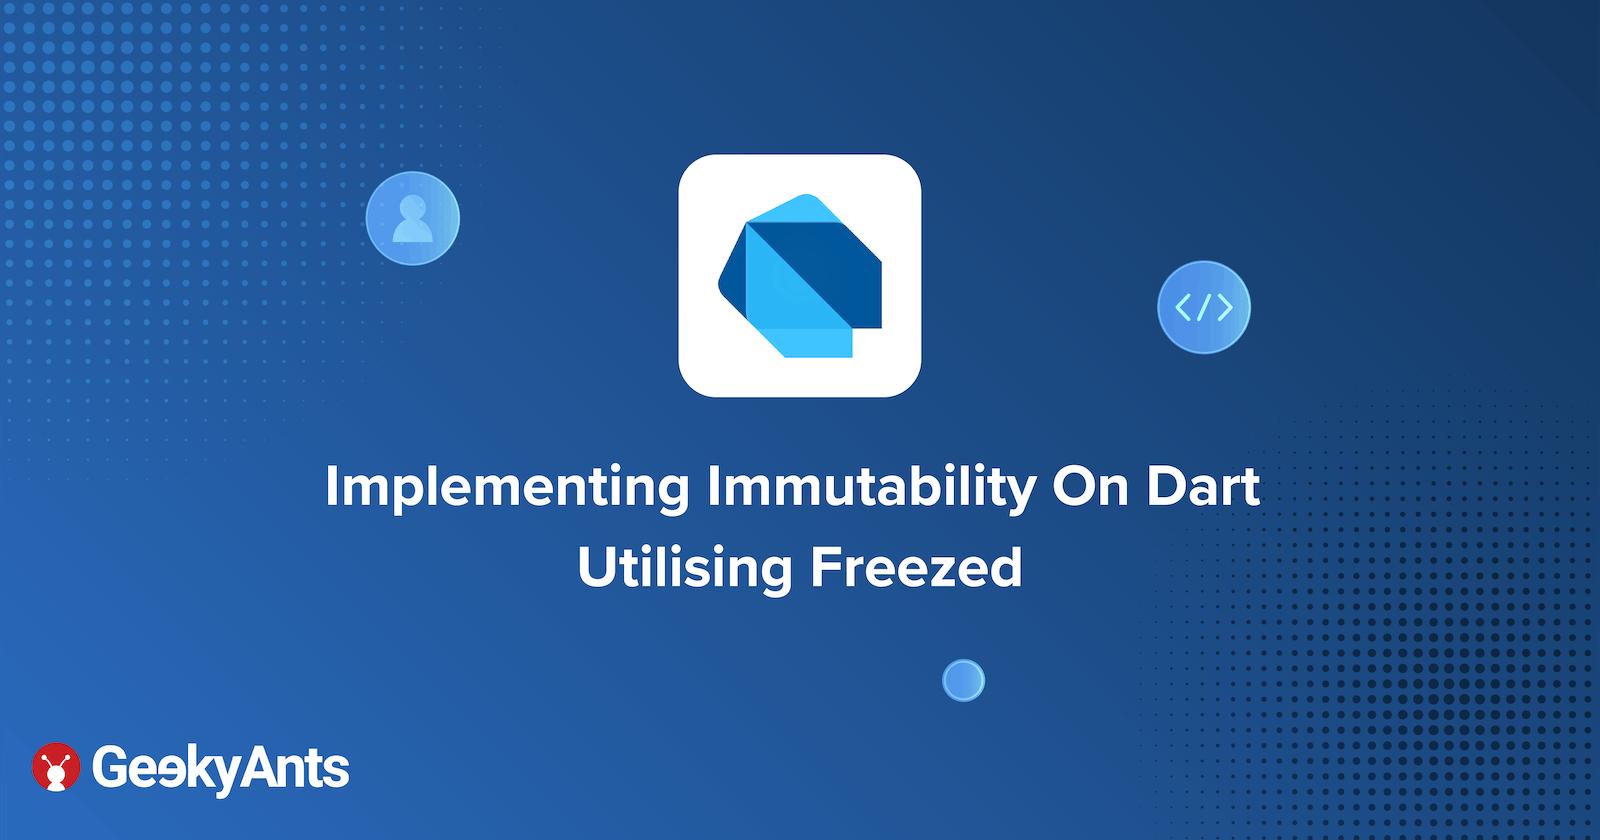 Implementing Immutability In Dart Utilising Freezed